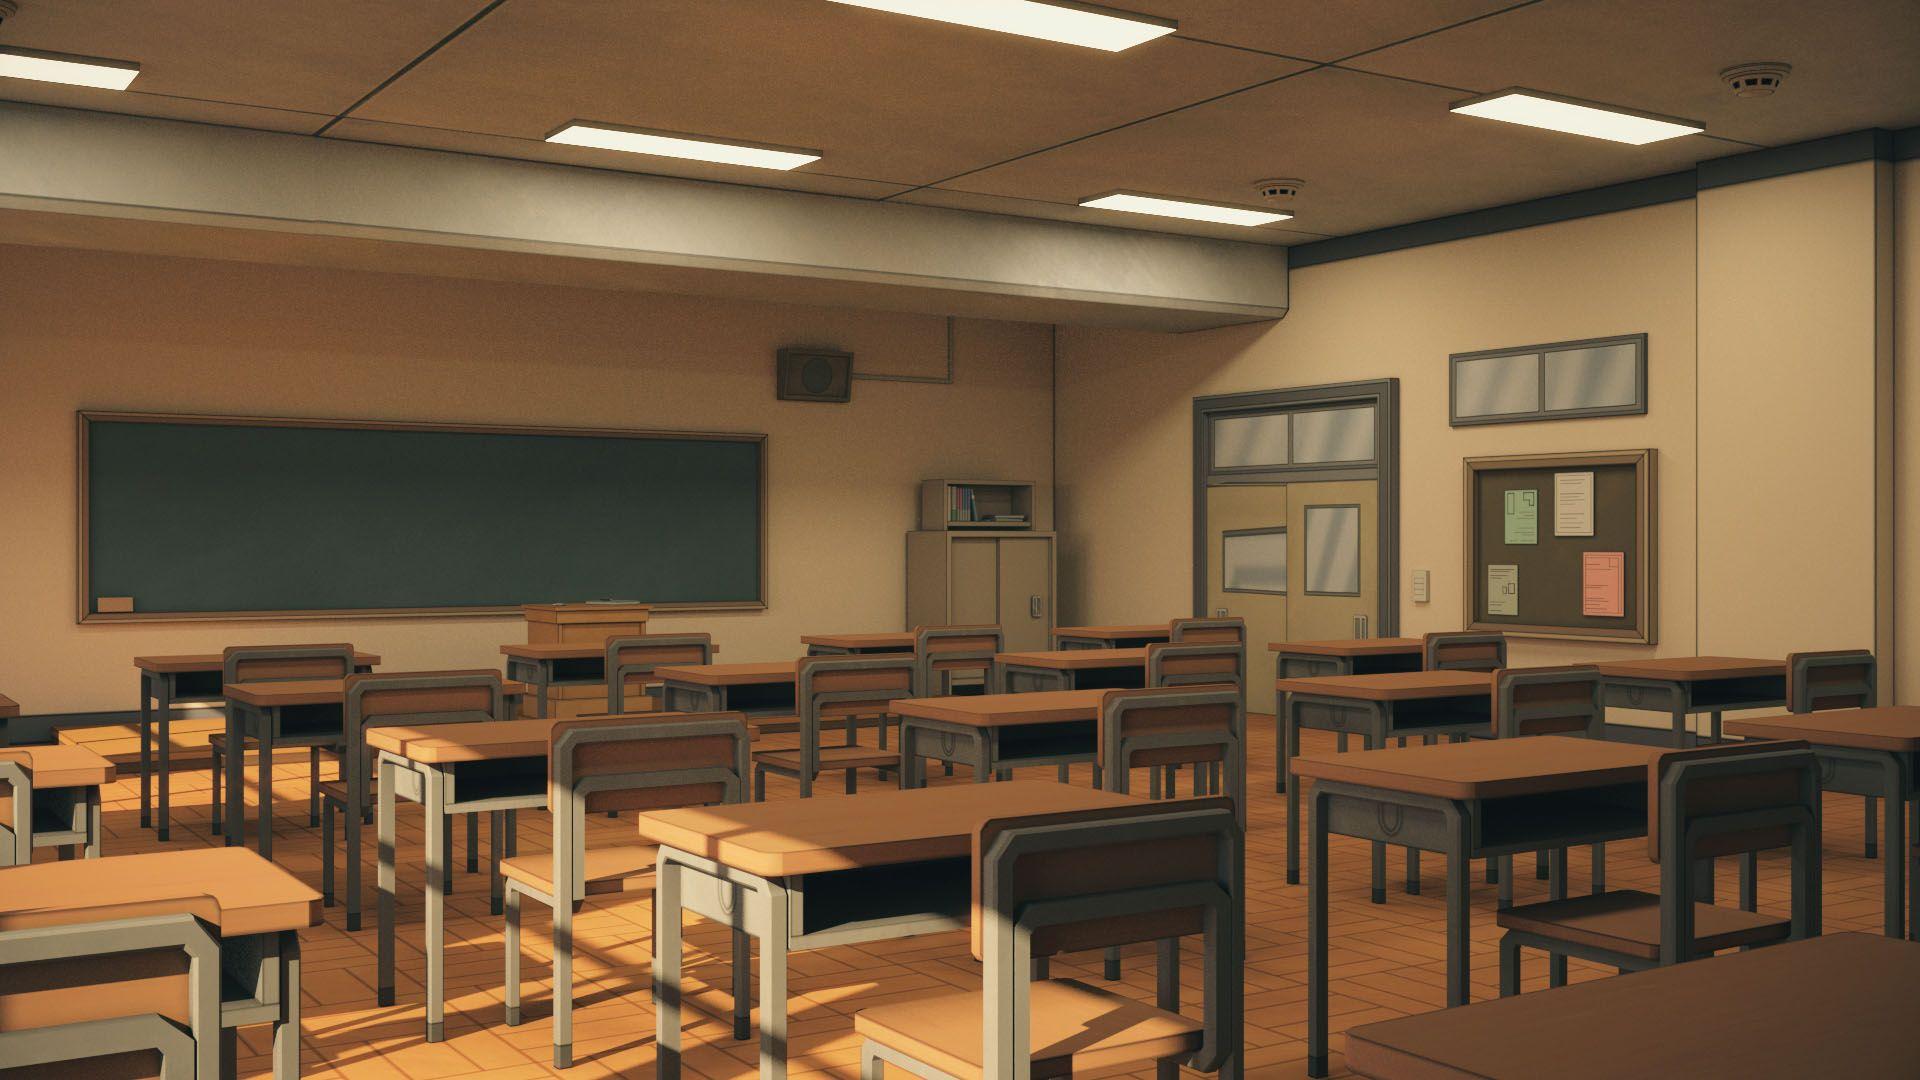 Anime Classroom Anime Classroom Classroom Architecture Classroom